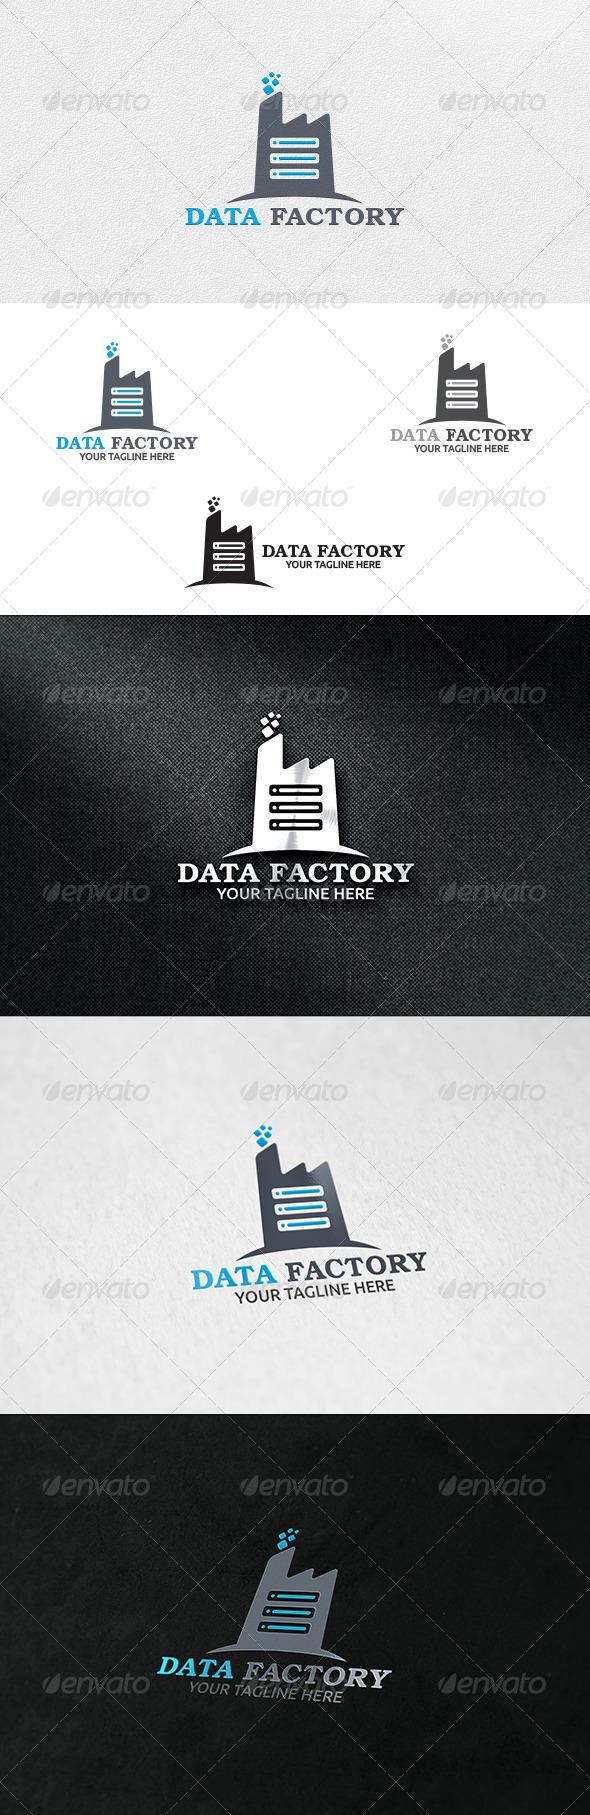 Data Factory - Logo Template - Buildings Logo Templates